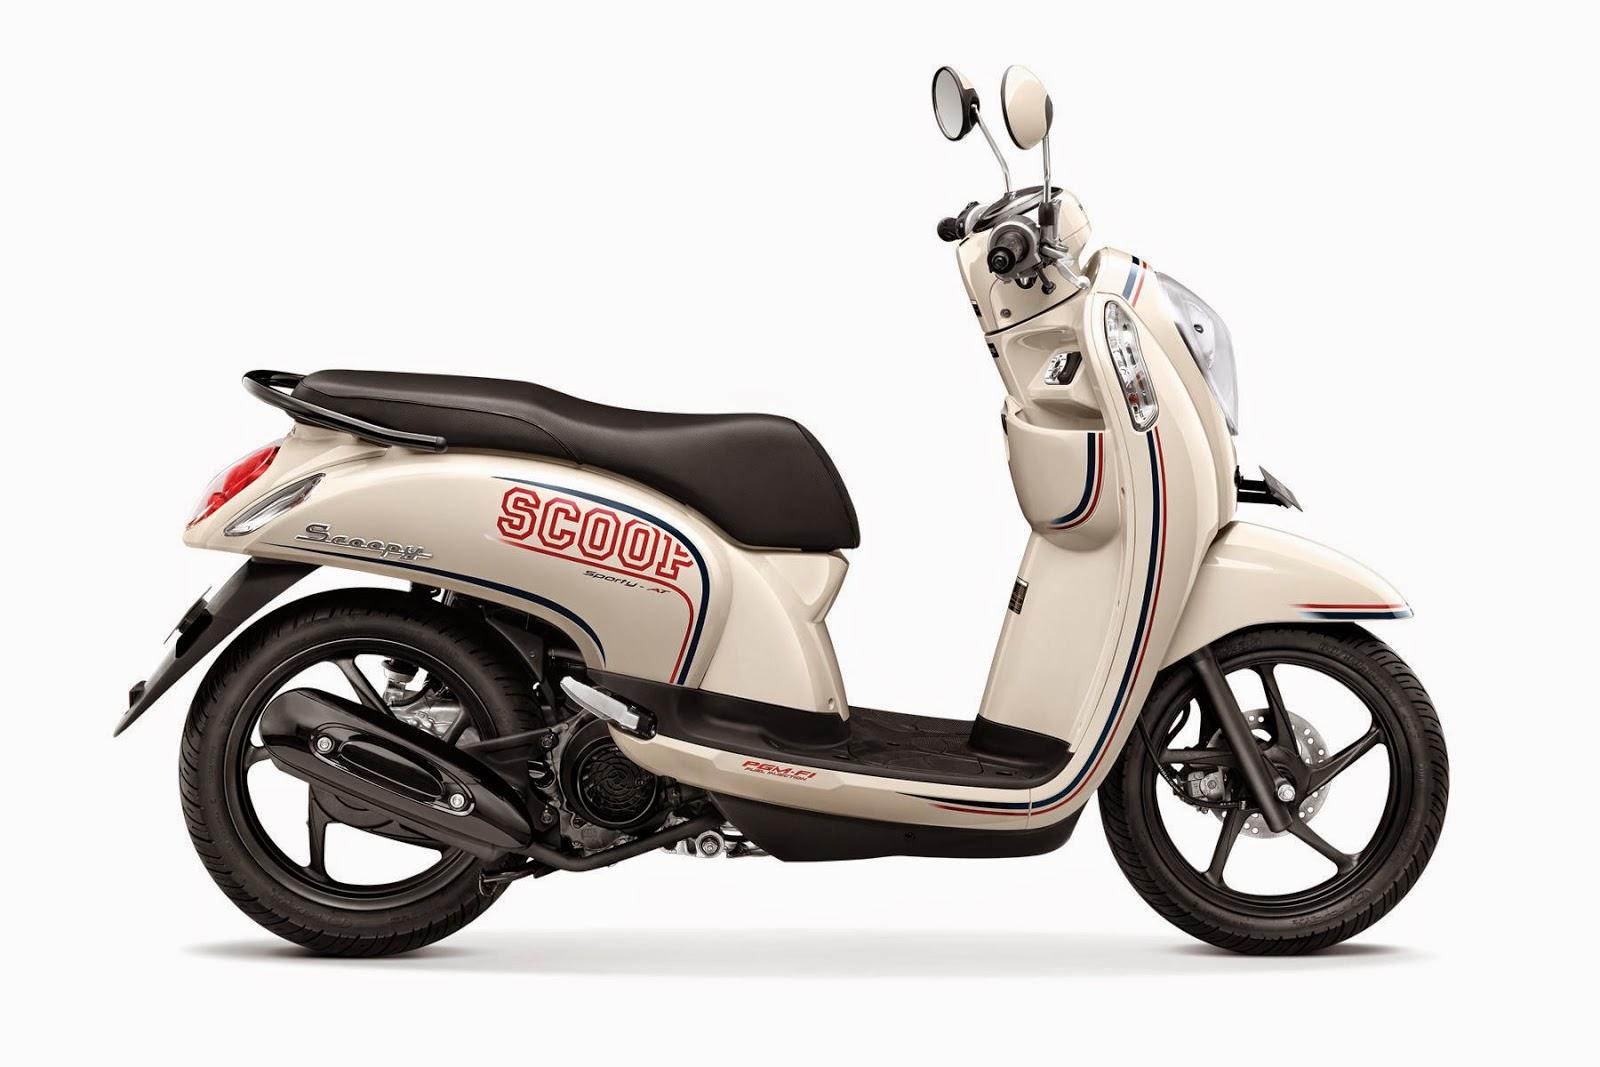 Kumpulan Harga Sepeda Motor Trail: Harga Honda New Scoopy